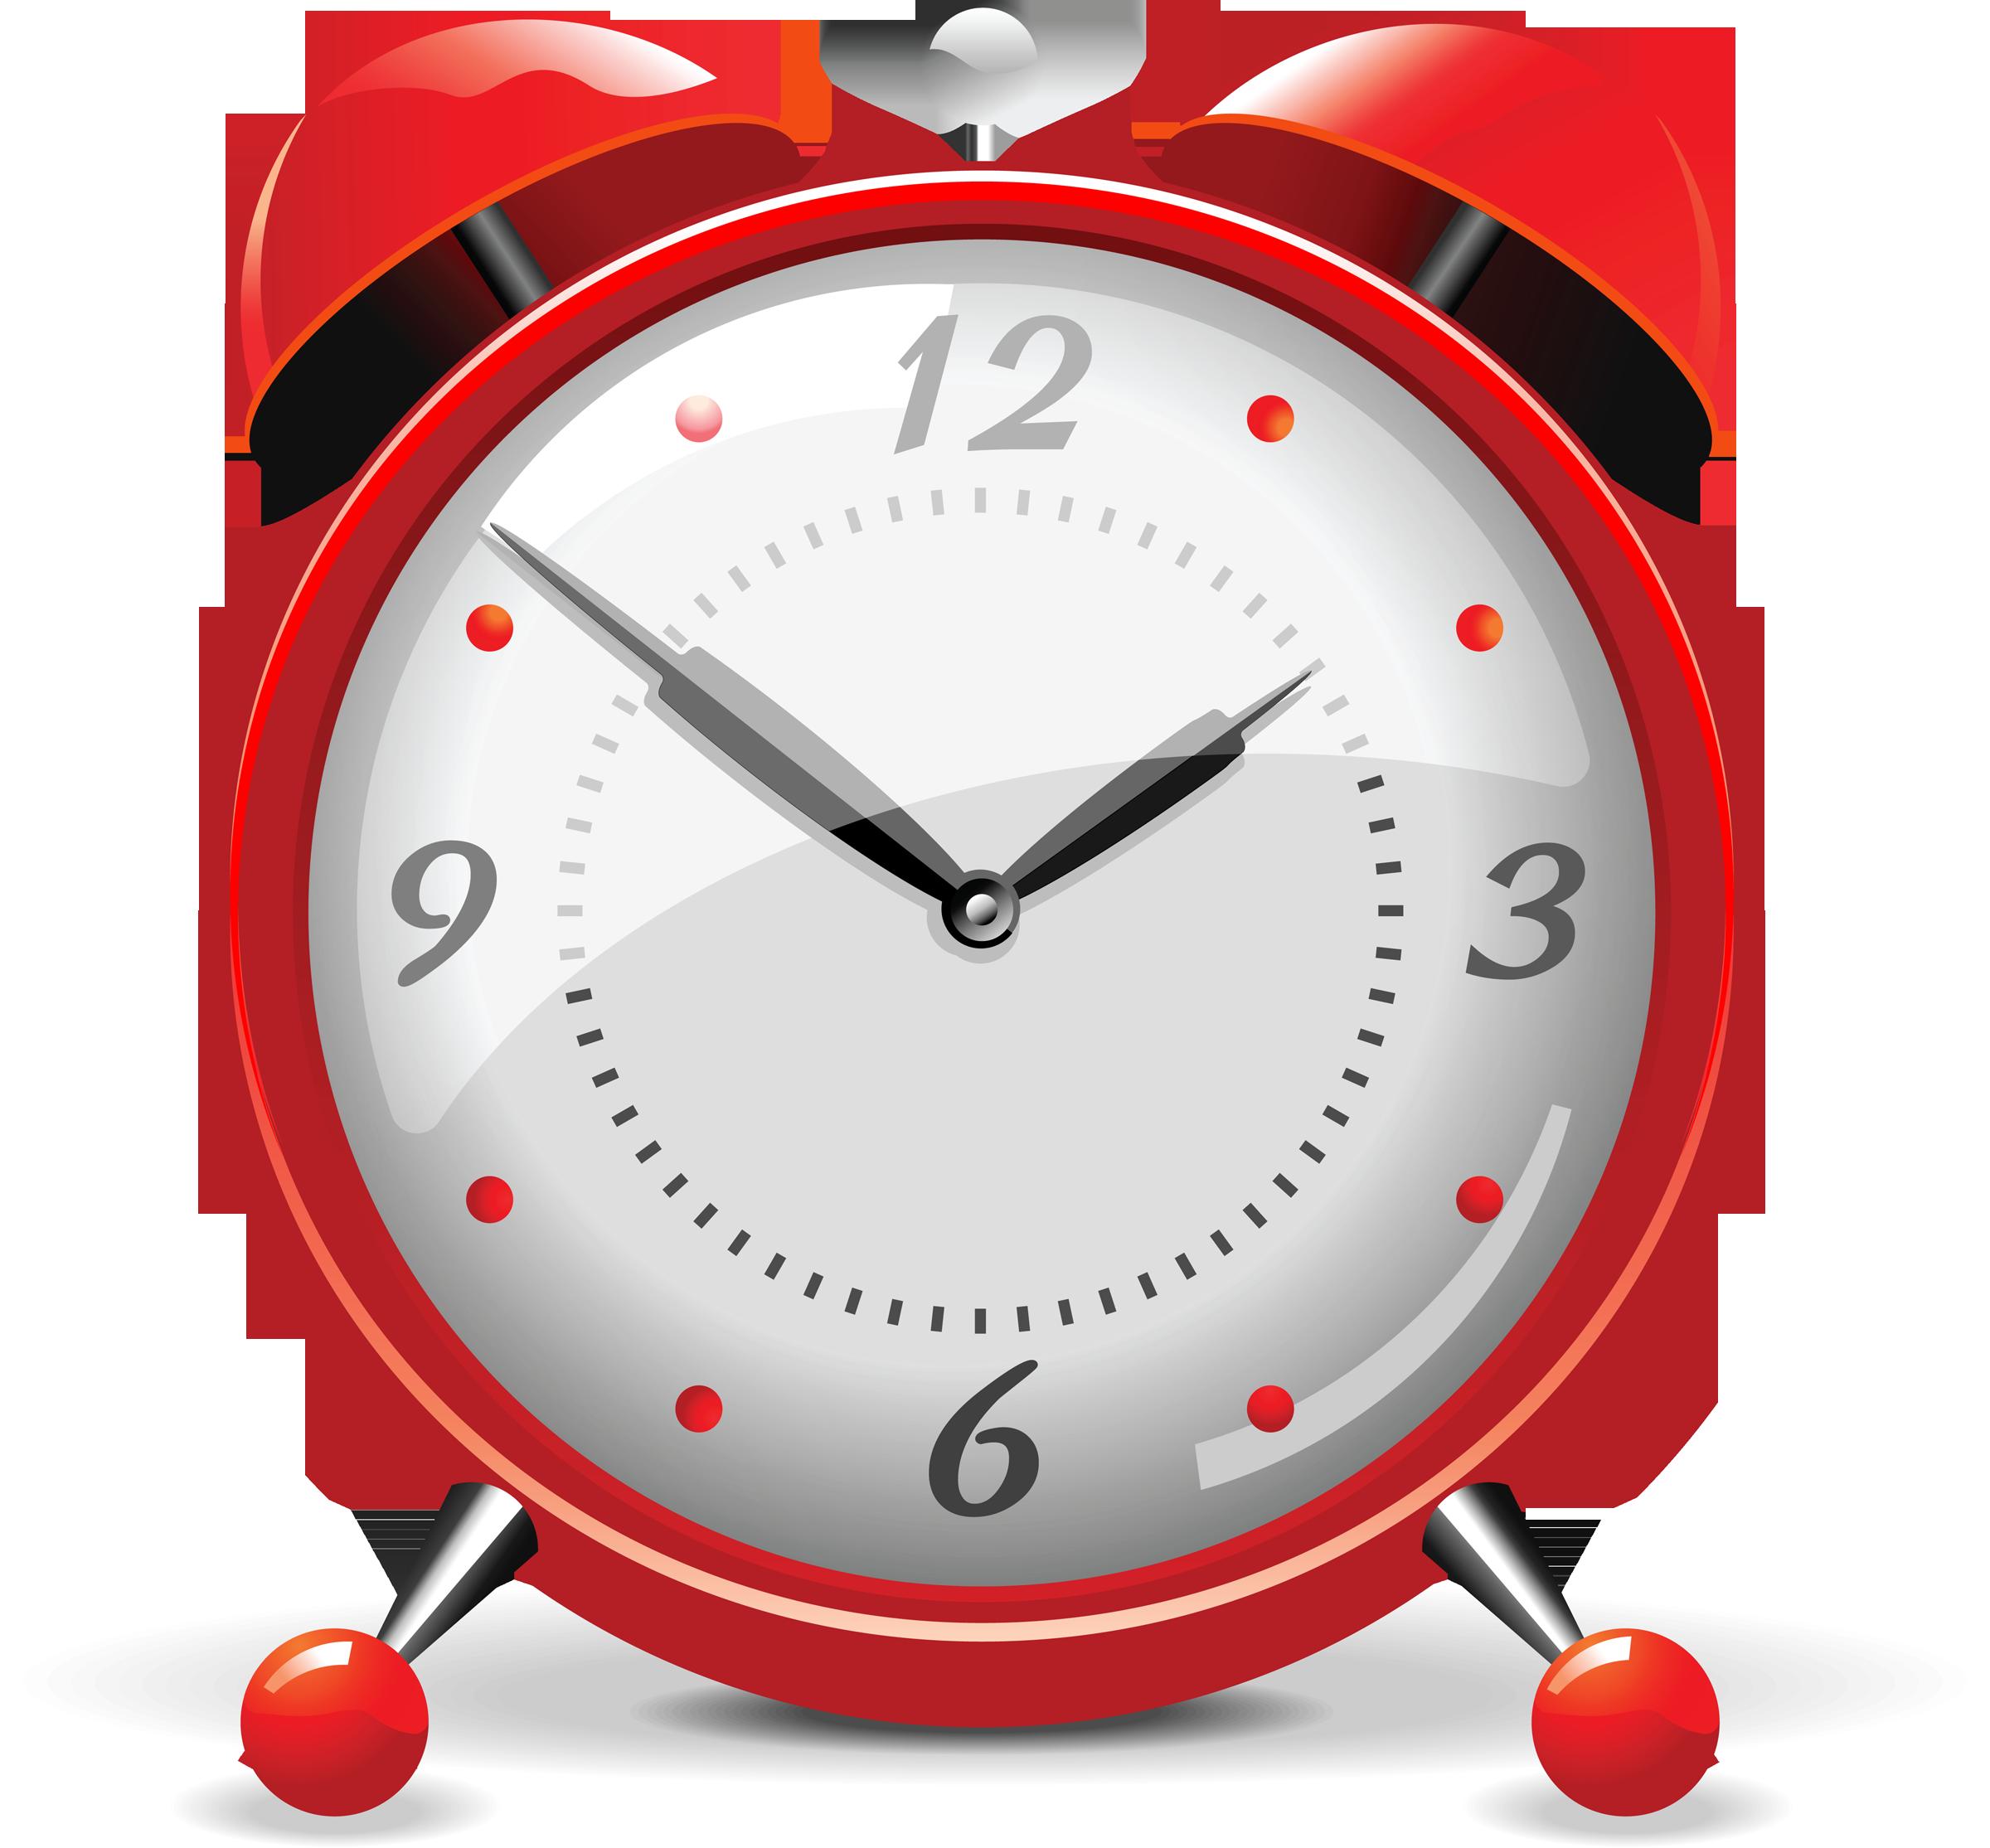 Red Alarm Clock PNG Image - PurePNG | Free transparent CC0 ...